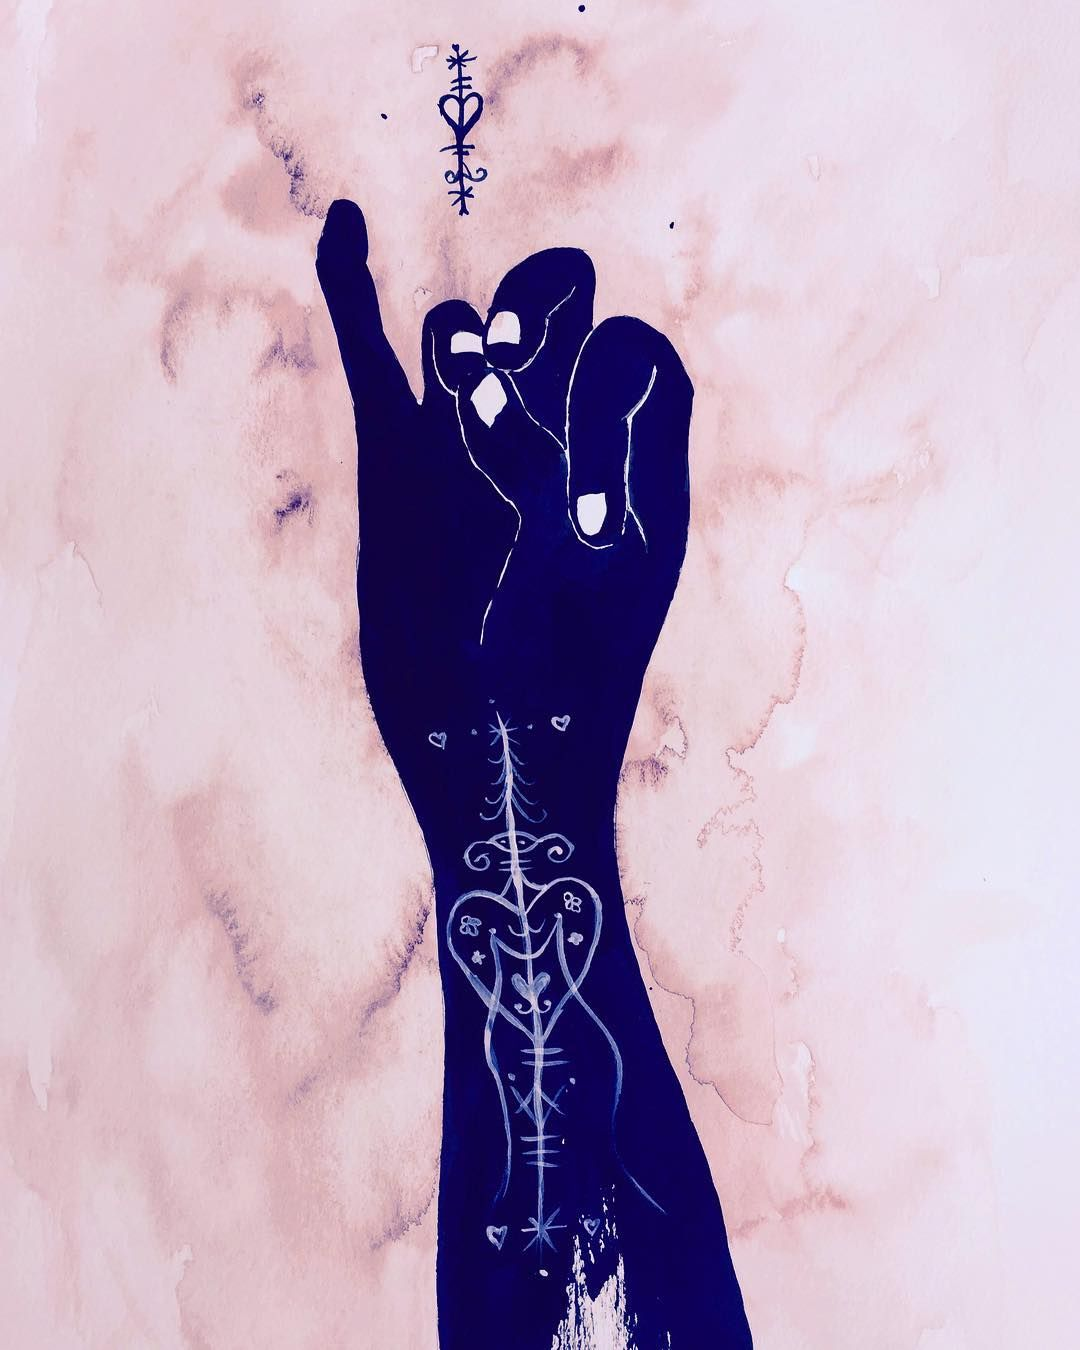 66 of 100mudras heart healing art watercolor ink symbols 66 of heart healing buycottarizona Image collections